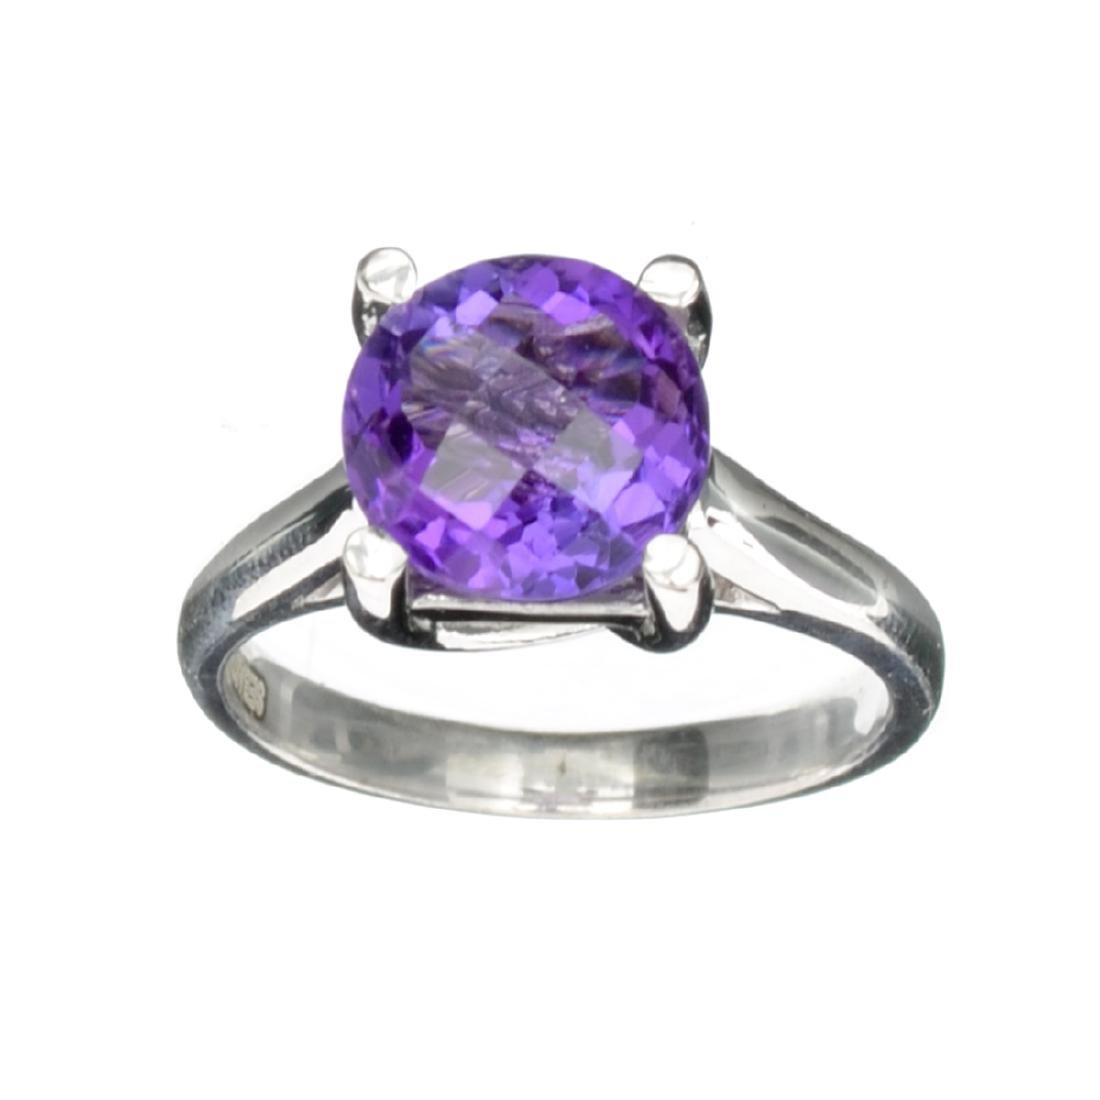 APP: 0.5k Fine Jewelry Designer Sebastian, 2.60CT Round